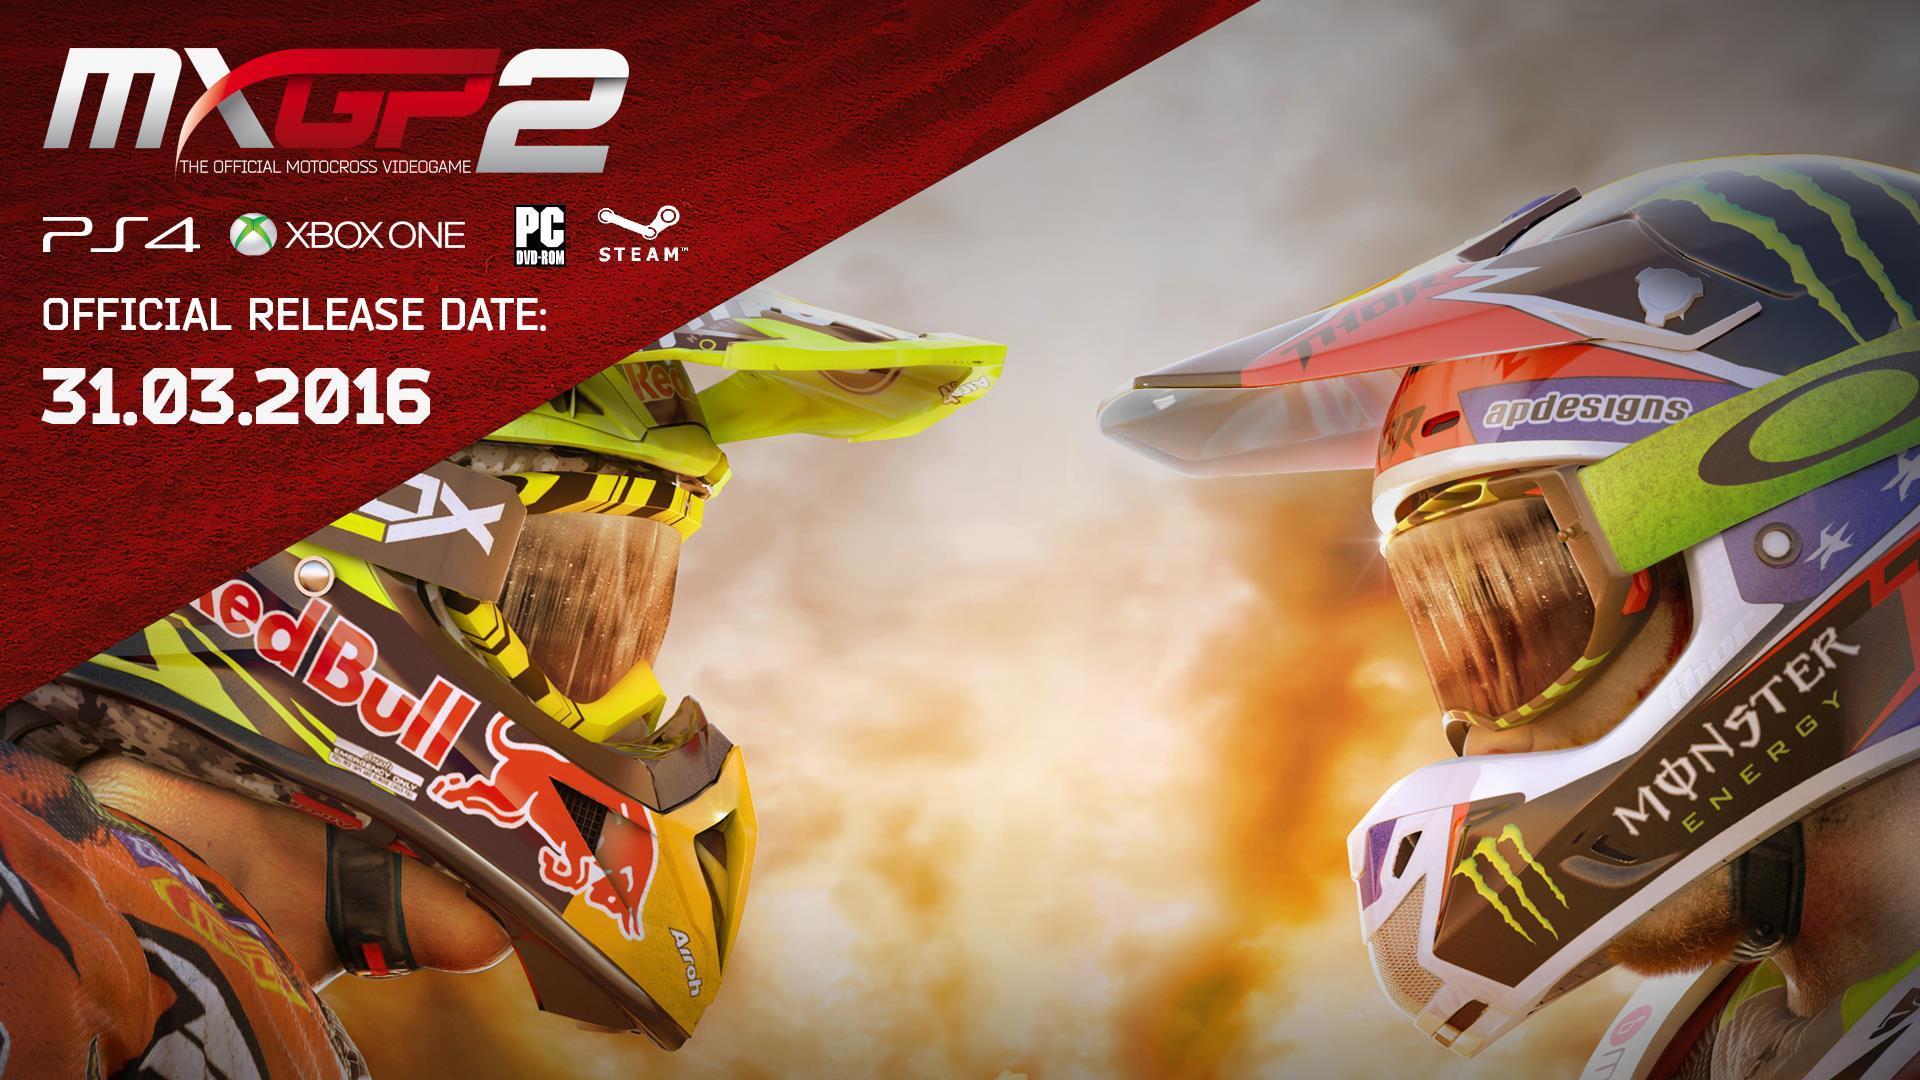 MXGP 2's release date revealed